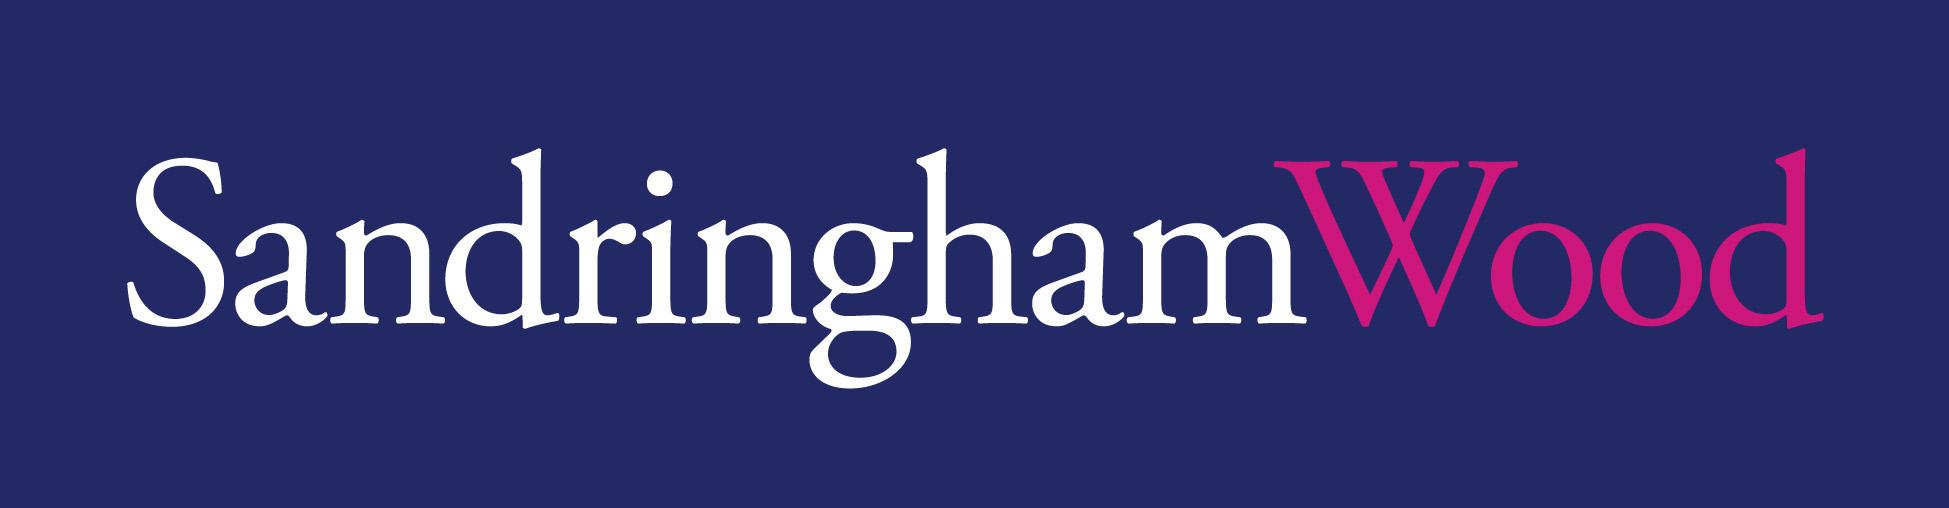 Sandringham Wood Recruitment Limited